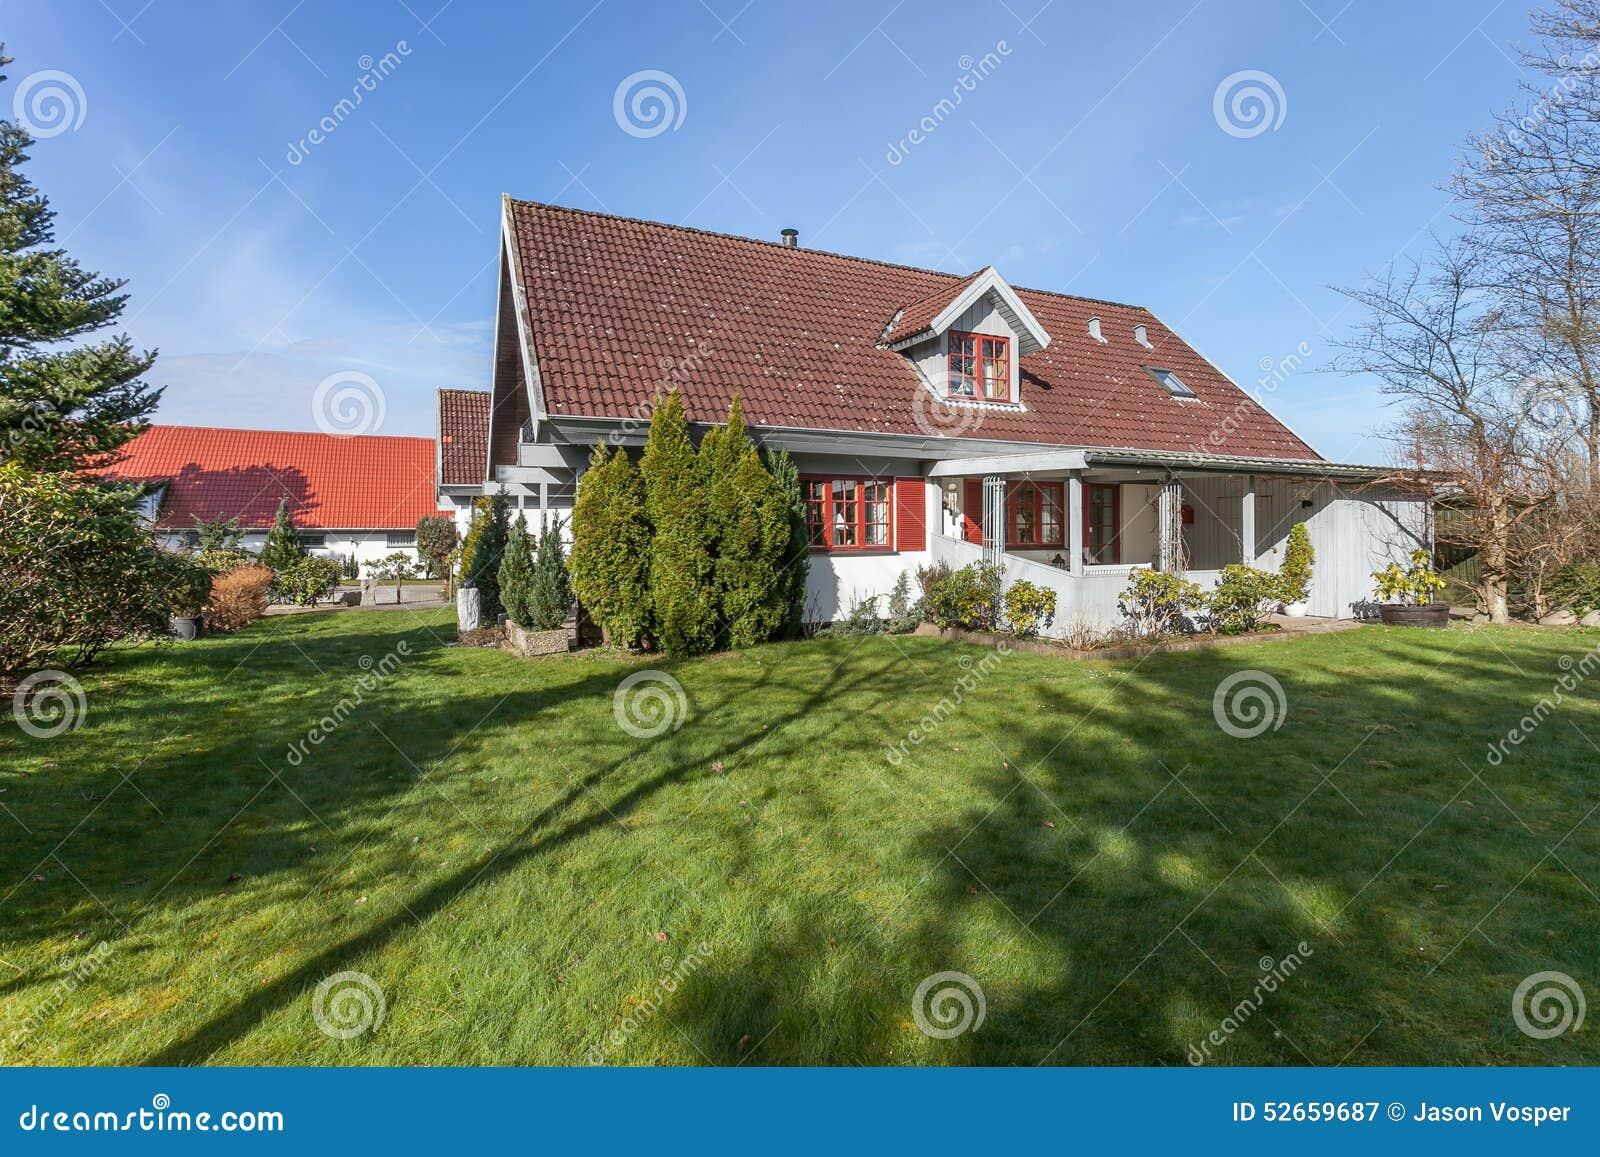 casa-e-jardim-em-dinamarca-52659687.jpg